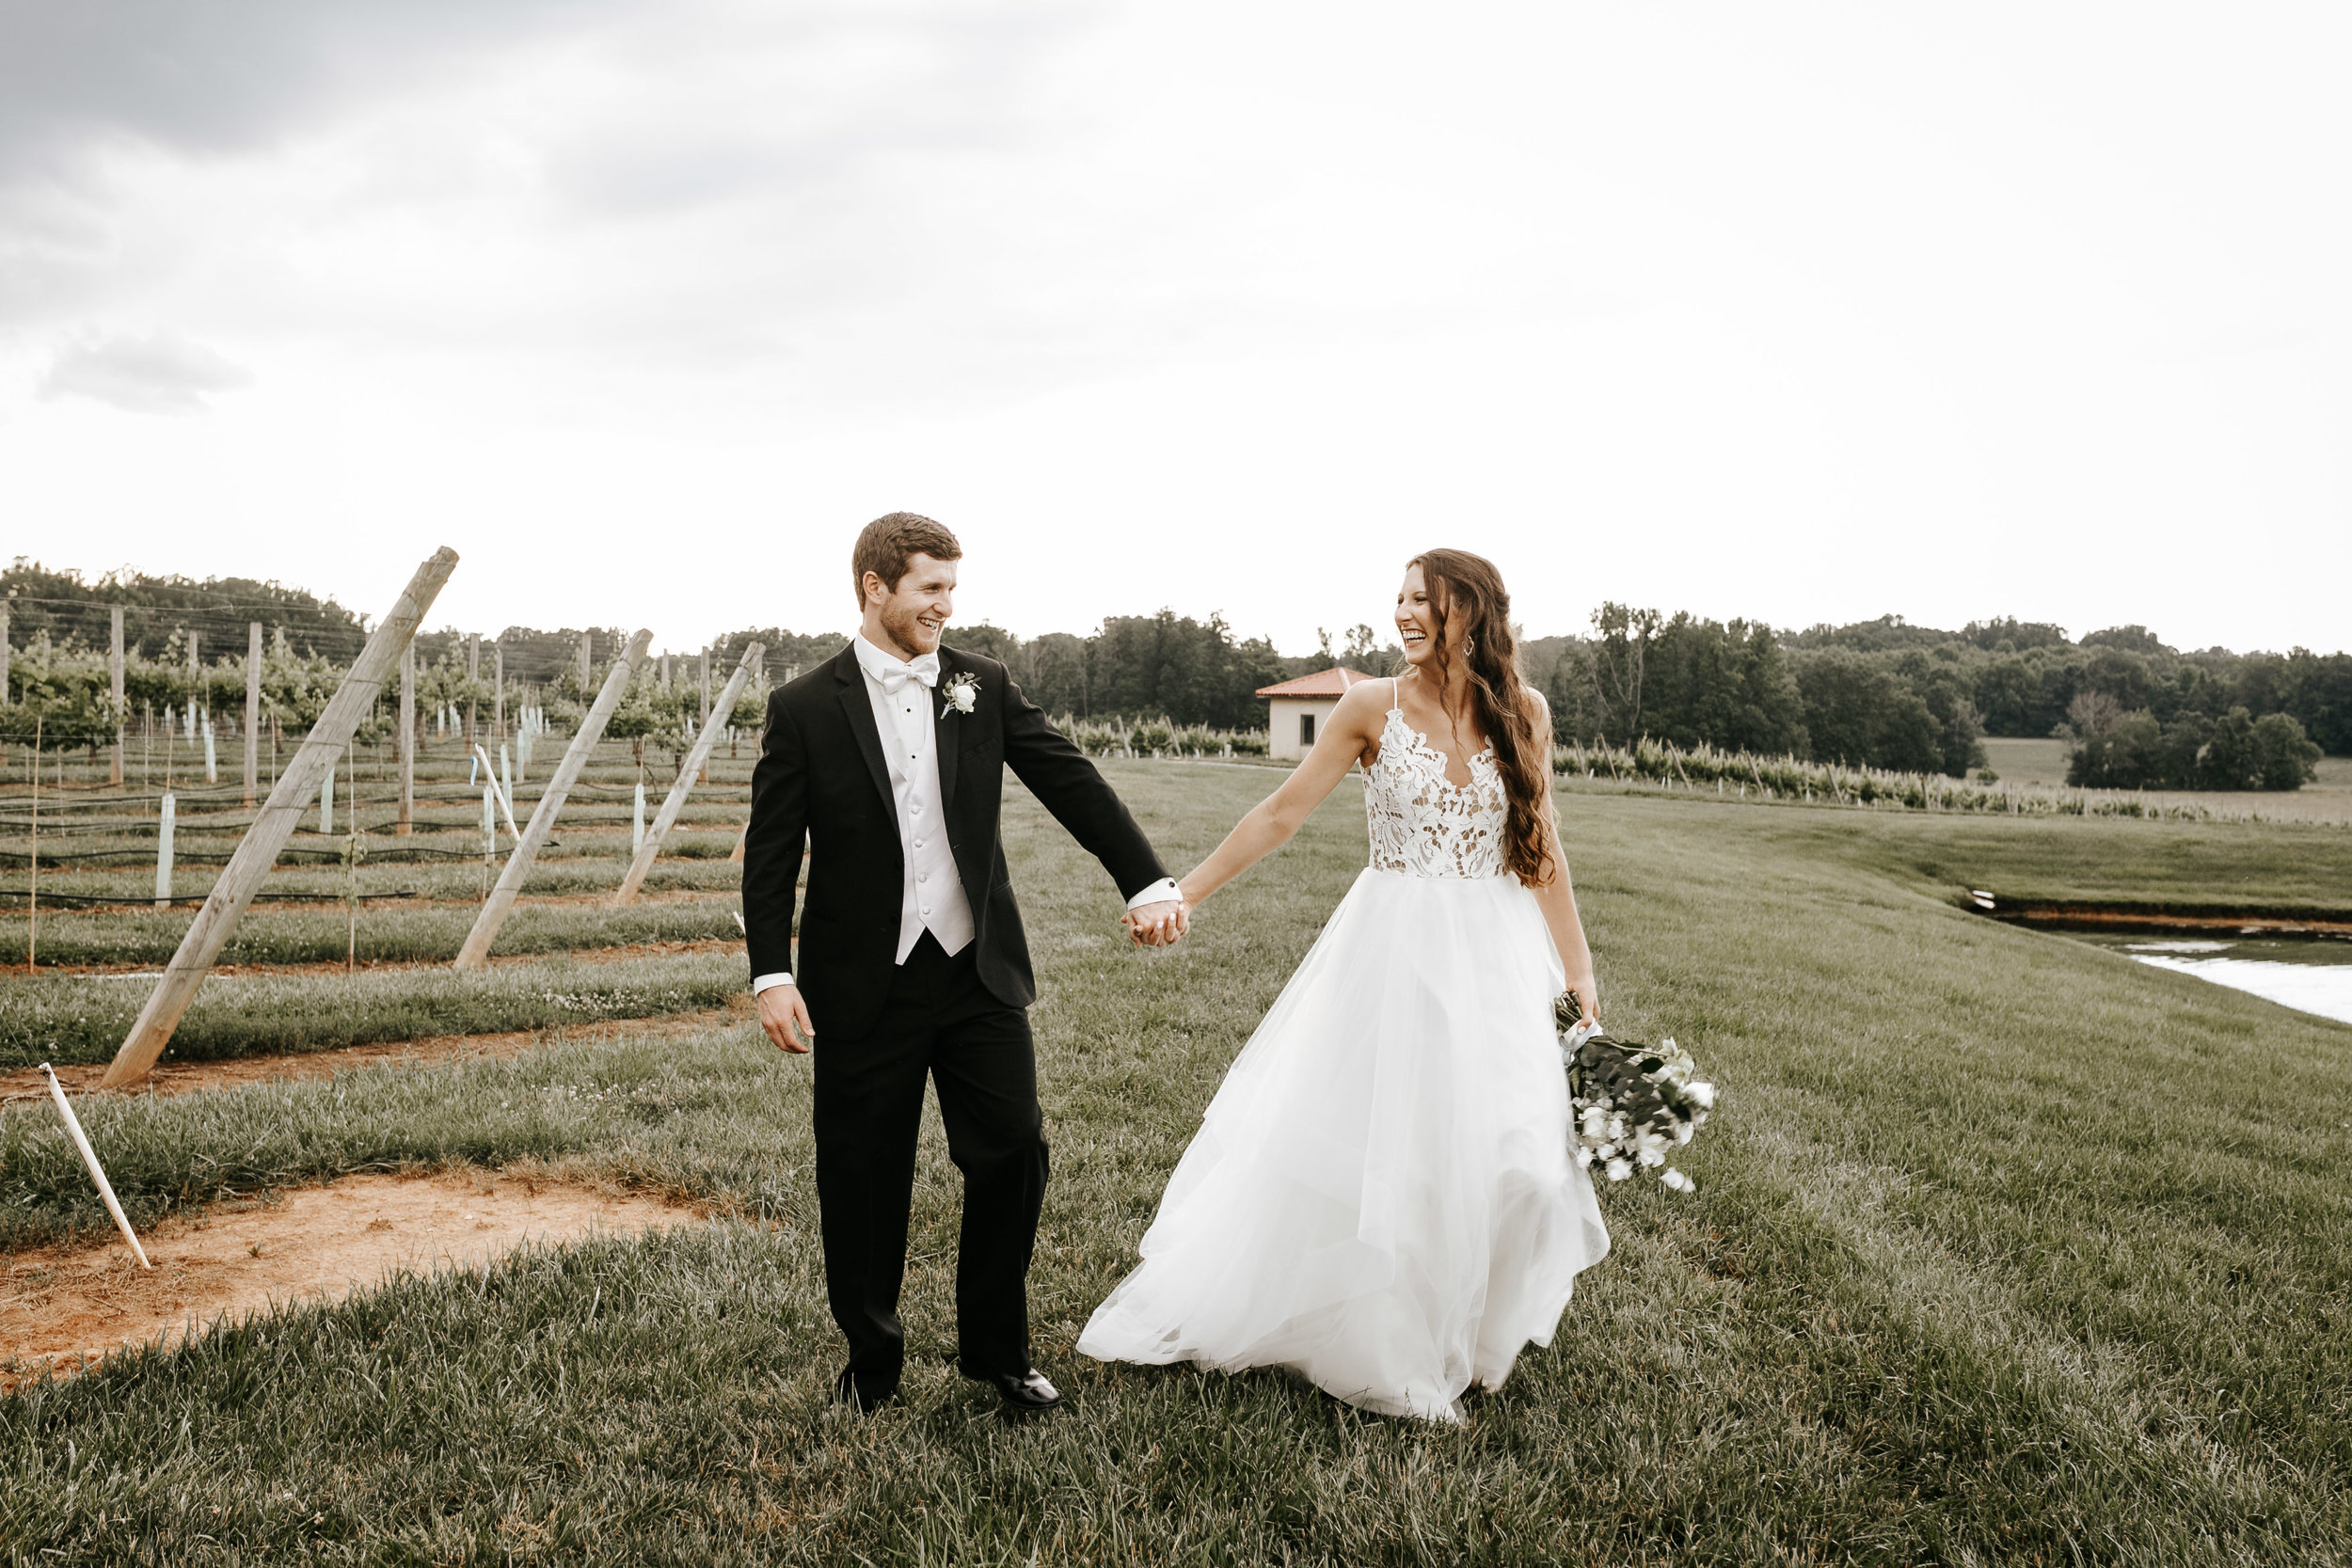 Bohemian-Wedding-Elopement-Photographer-Carolina-61.jpg